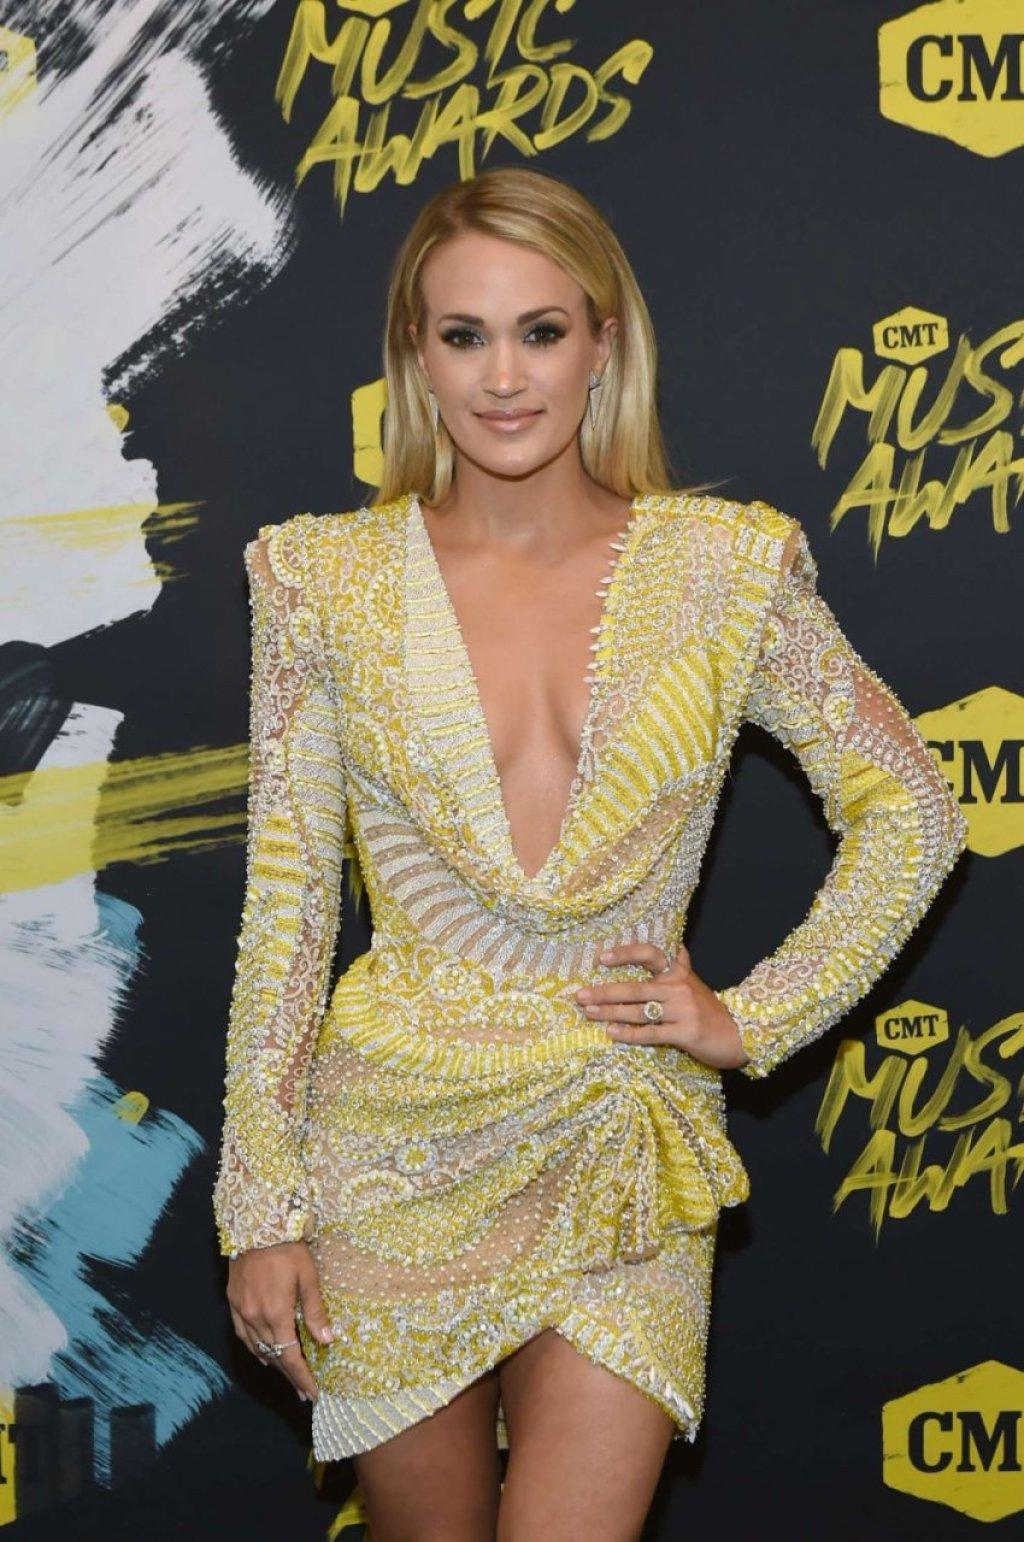 Carrie Underwood Sexy (31 Photos)